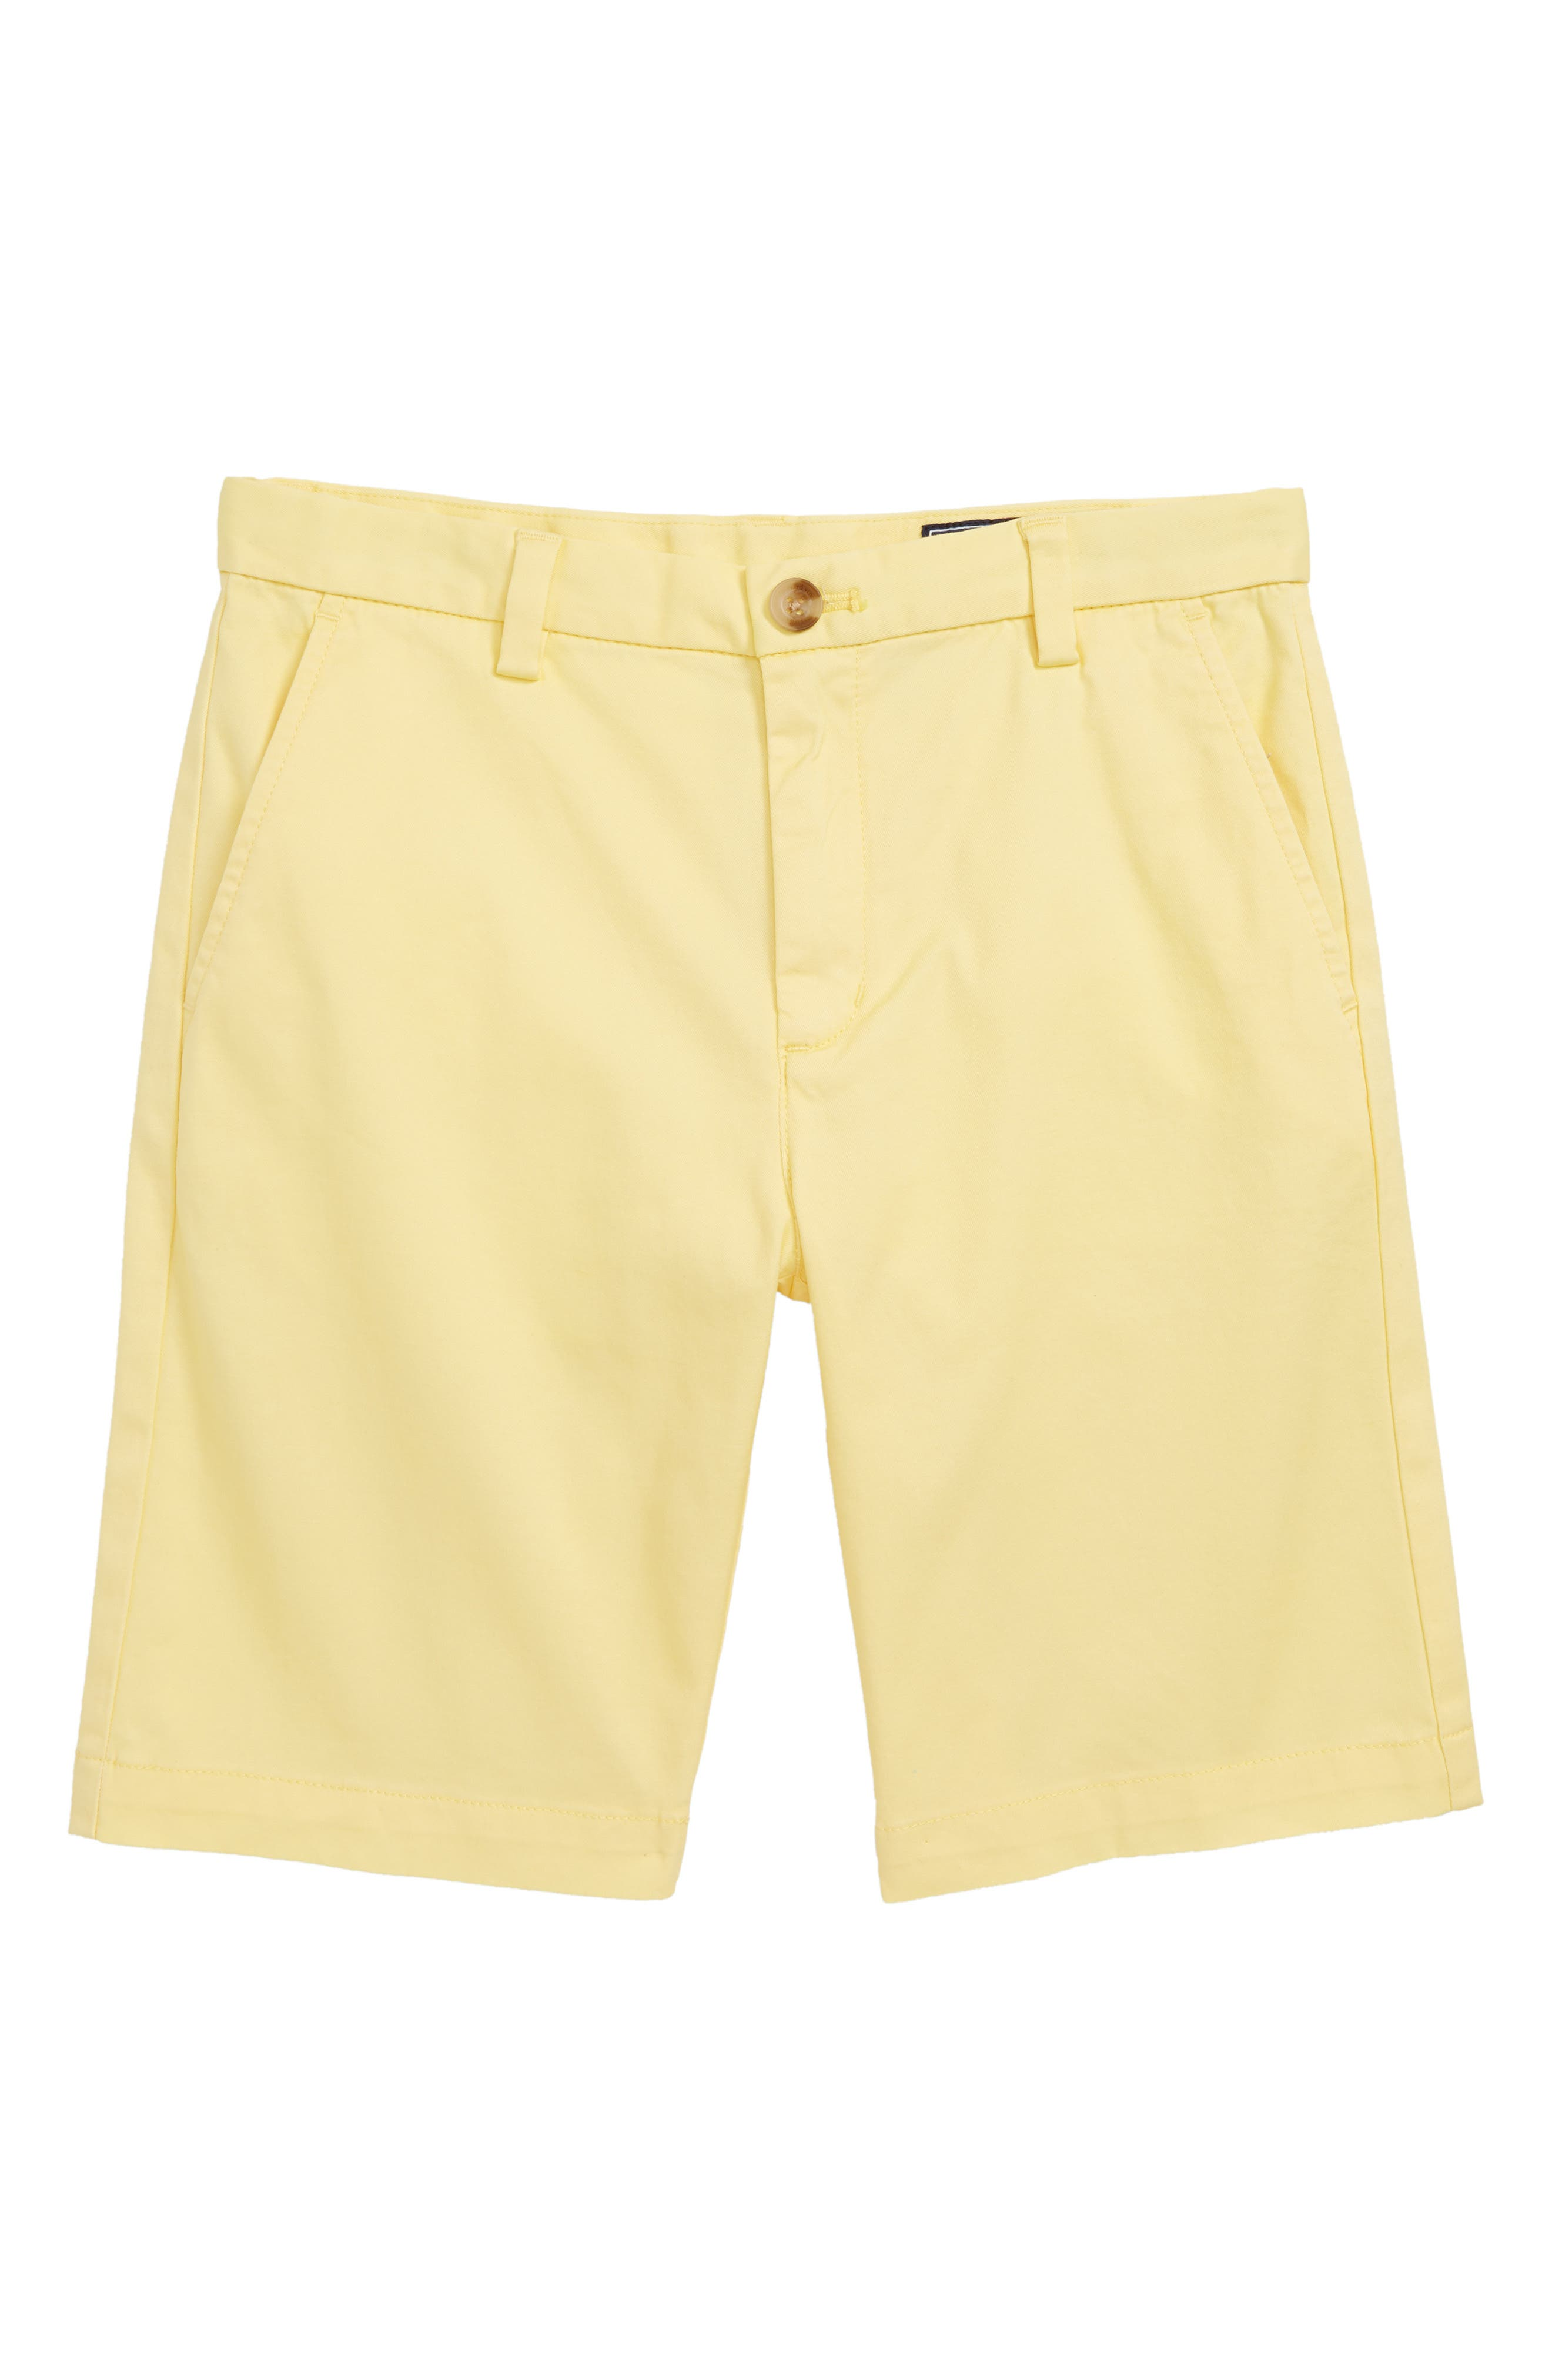 Stretch Breaker Shorts,                         Main,                         color, Lemon Drop